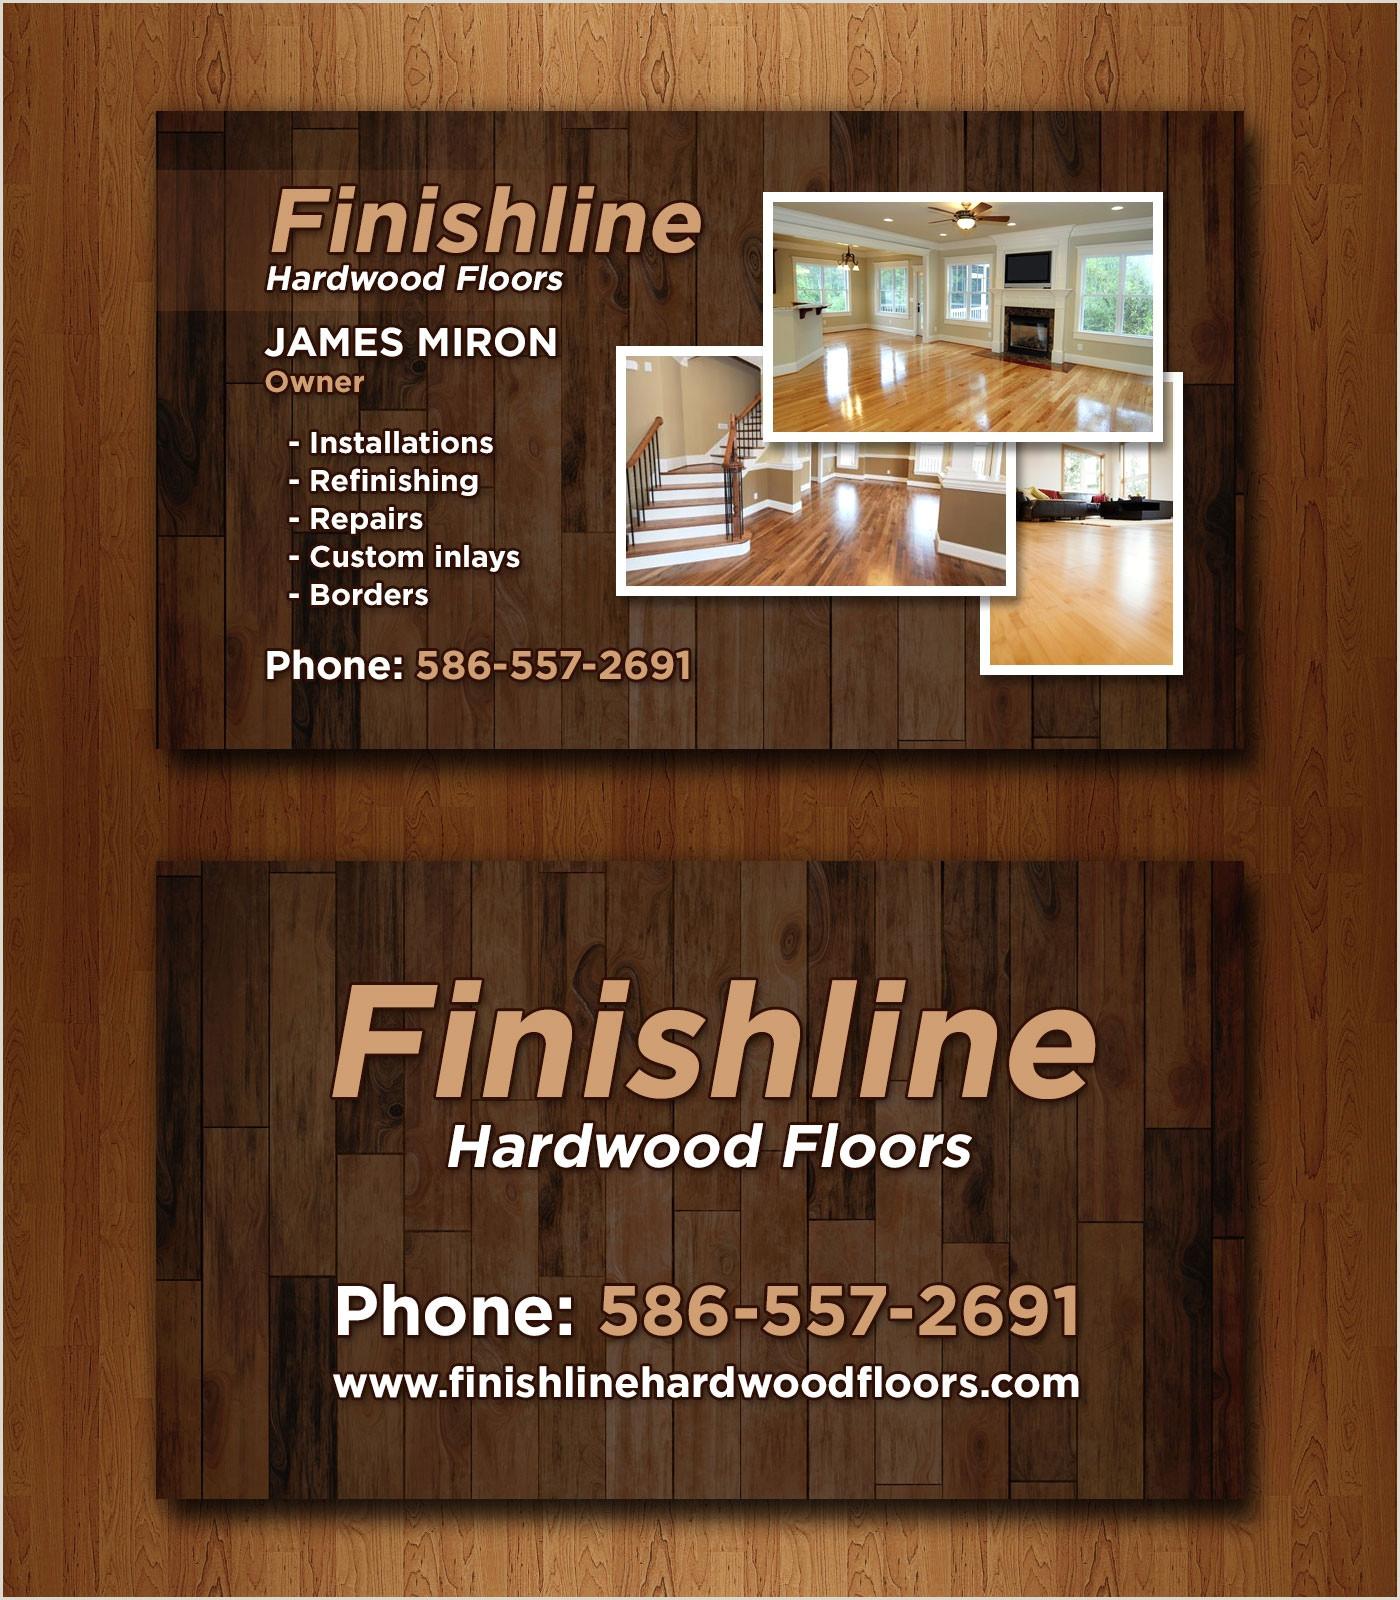 Business Card Samples 14 Popular Hardwood Flooring Business Card Template